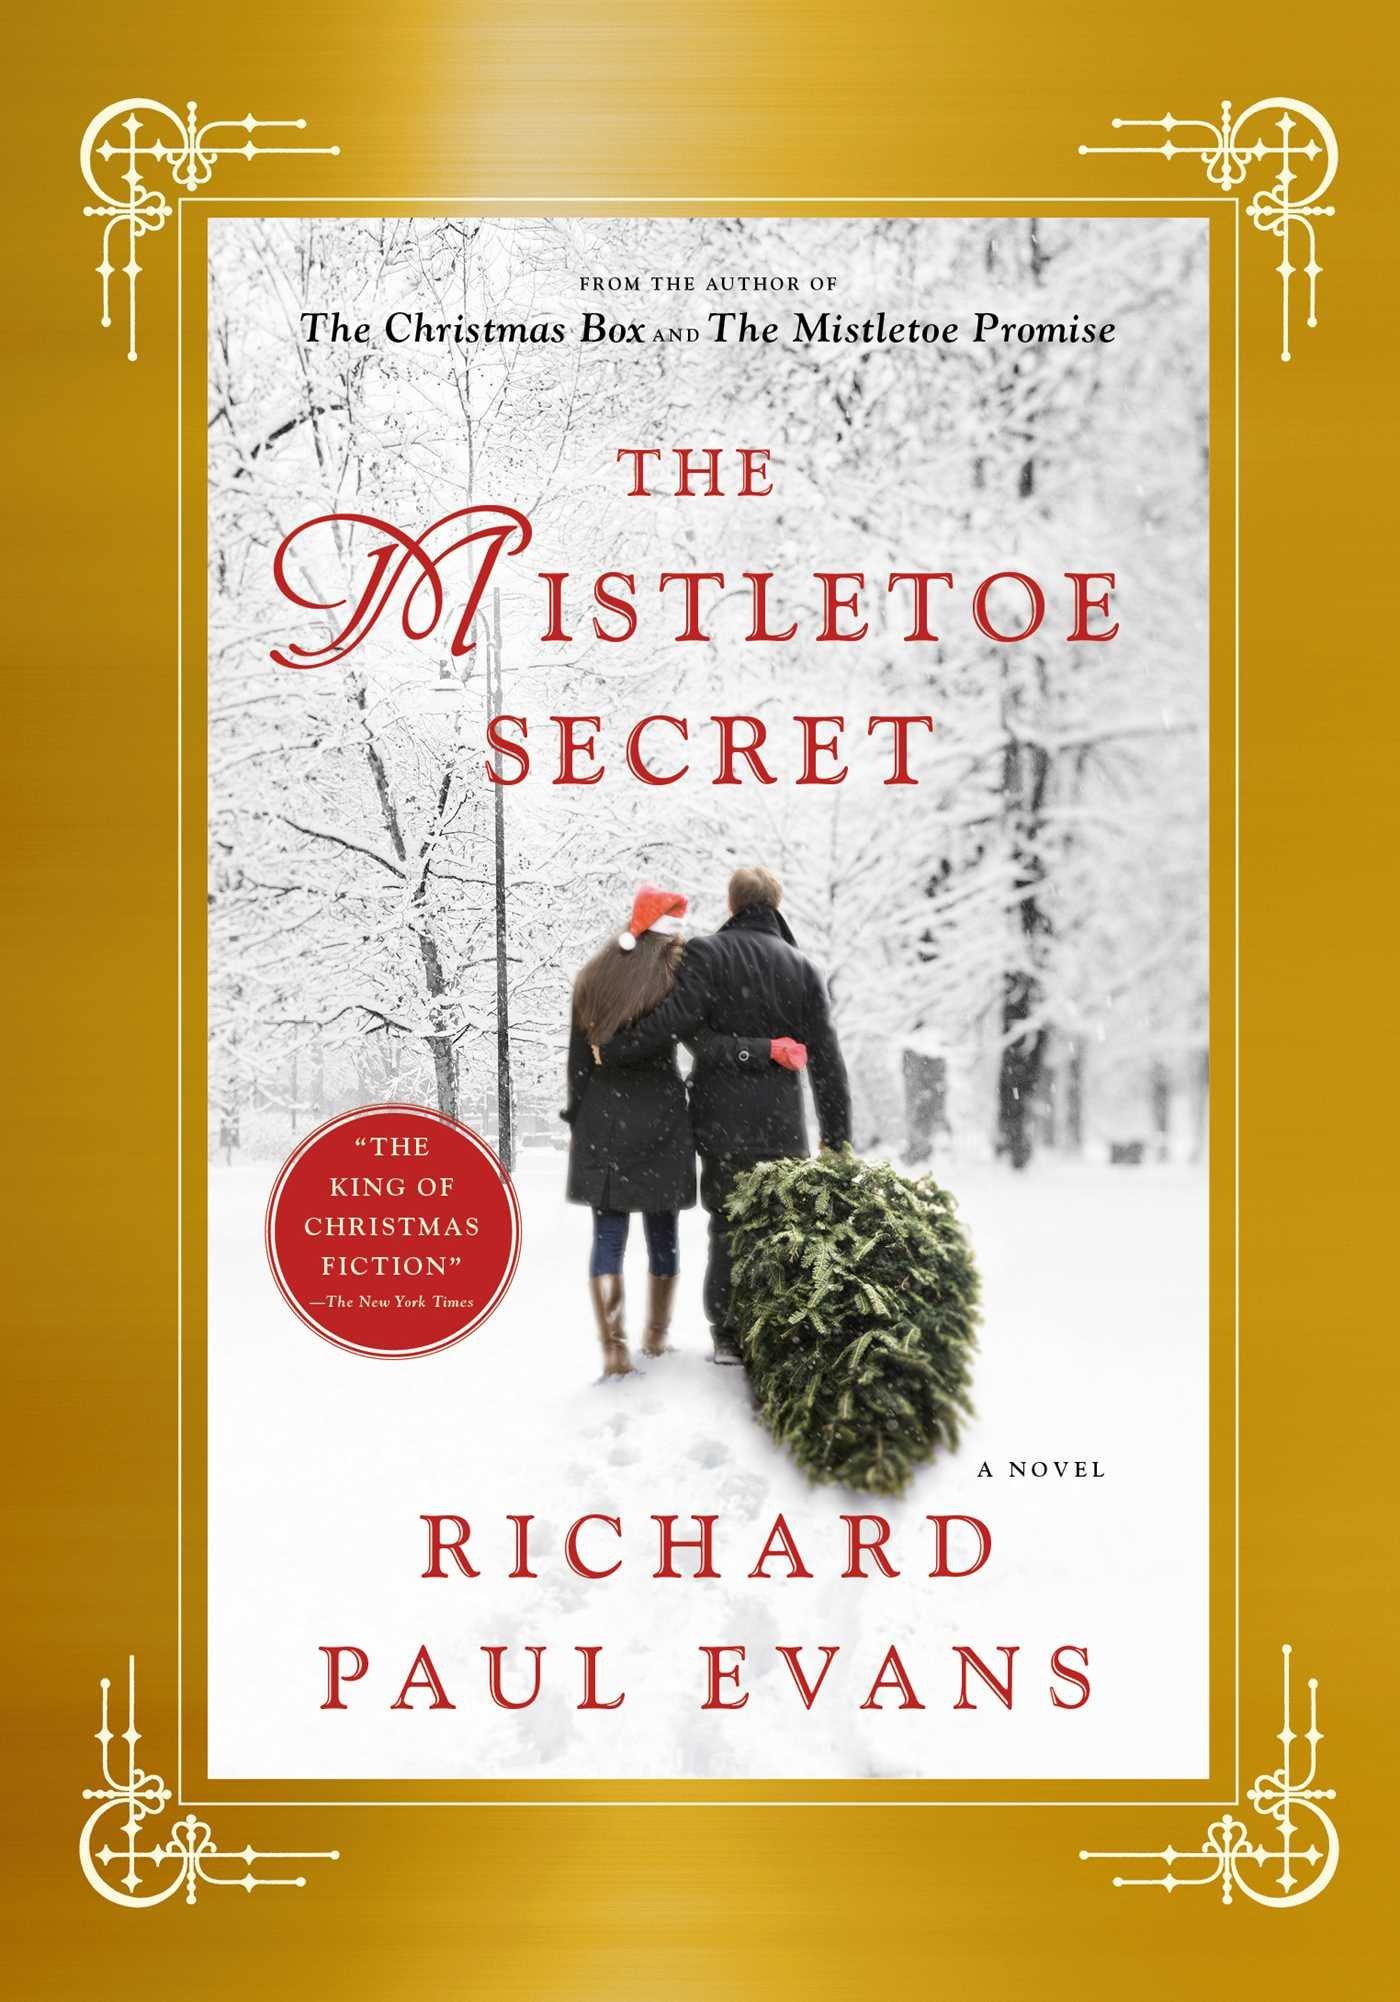 THE MISTLETOE SECRET by Richard Paul Evans | Stacy Alesi's ...